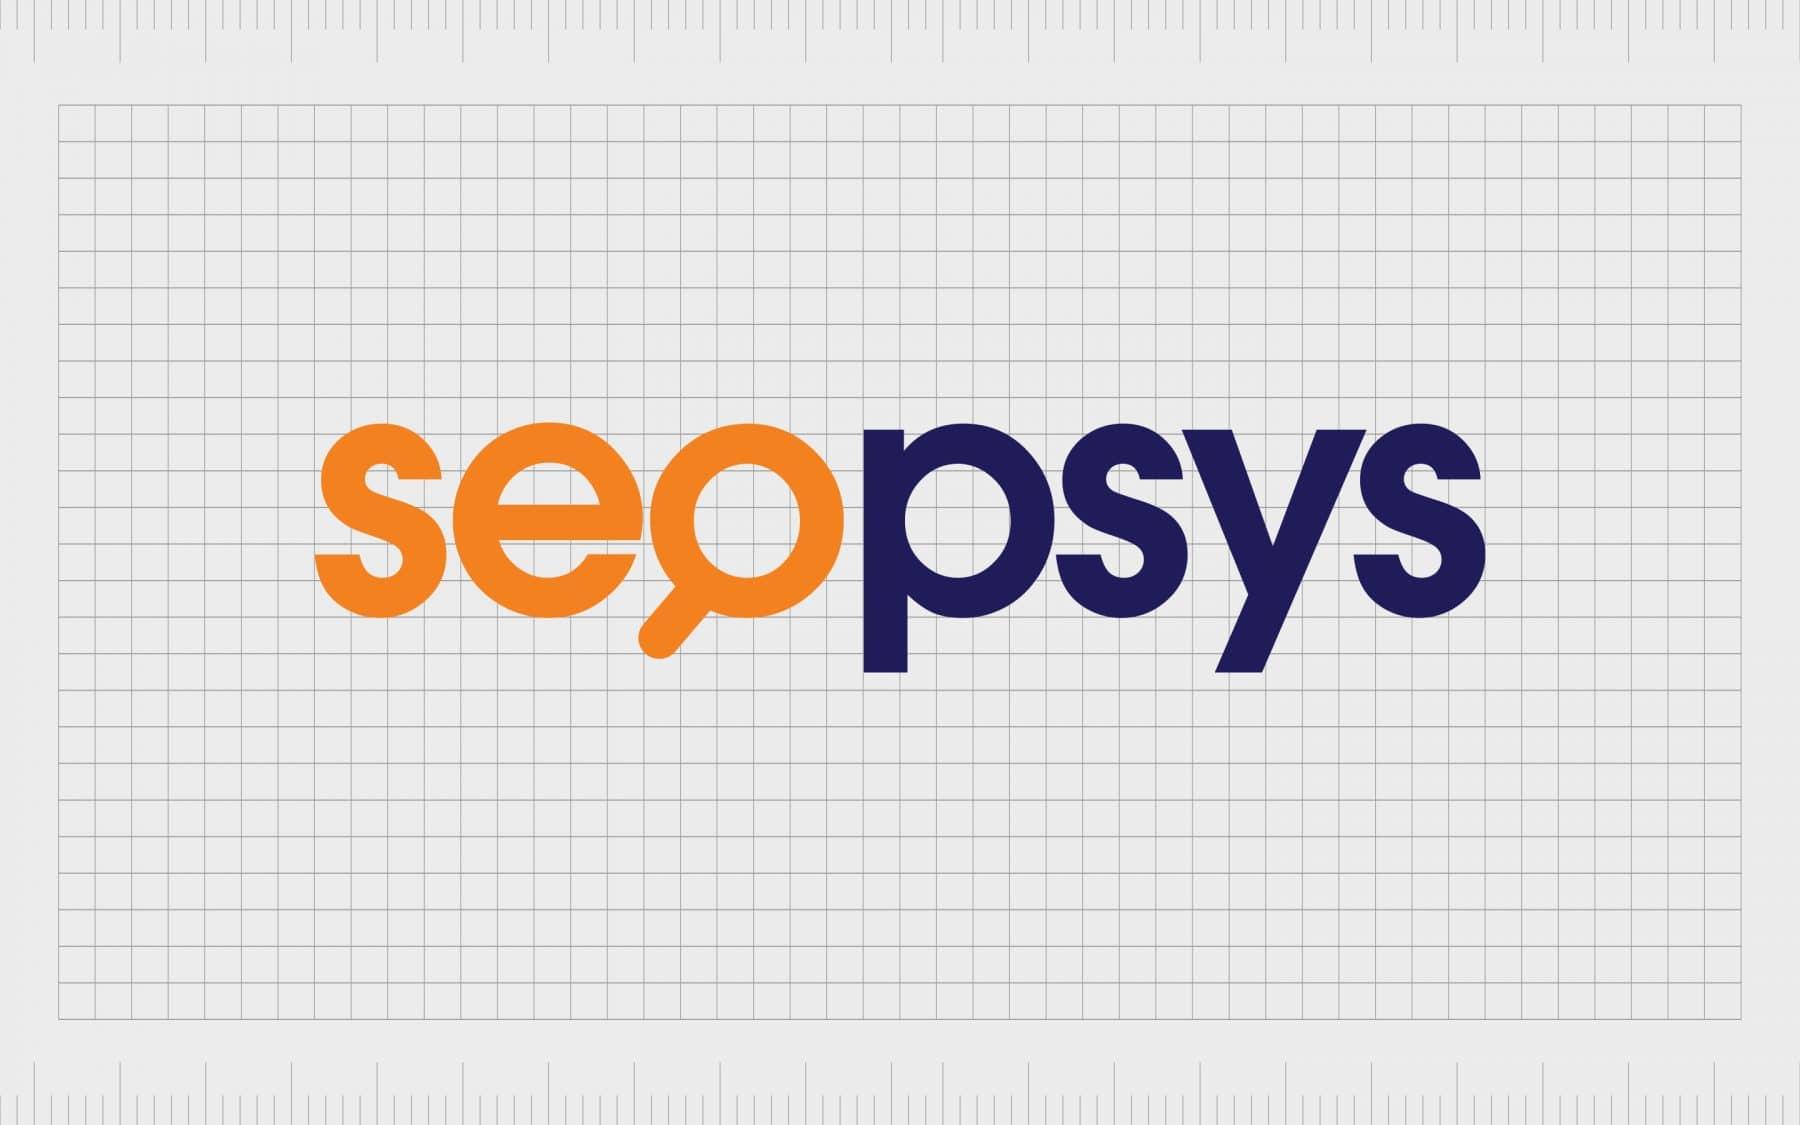 Seopsys